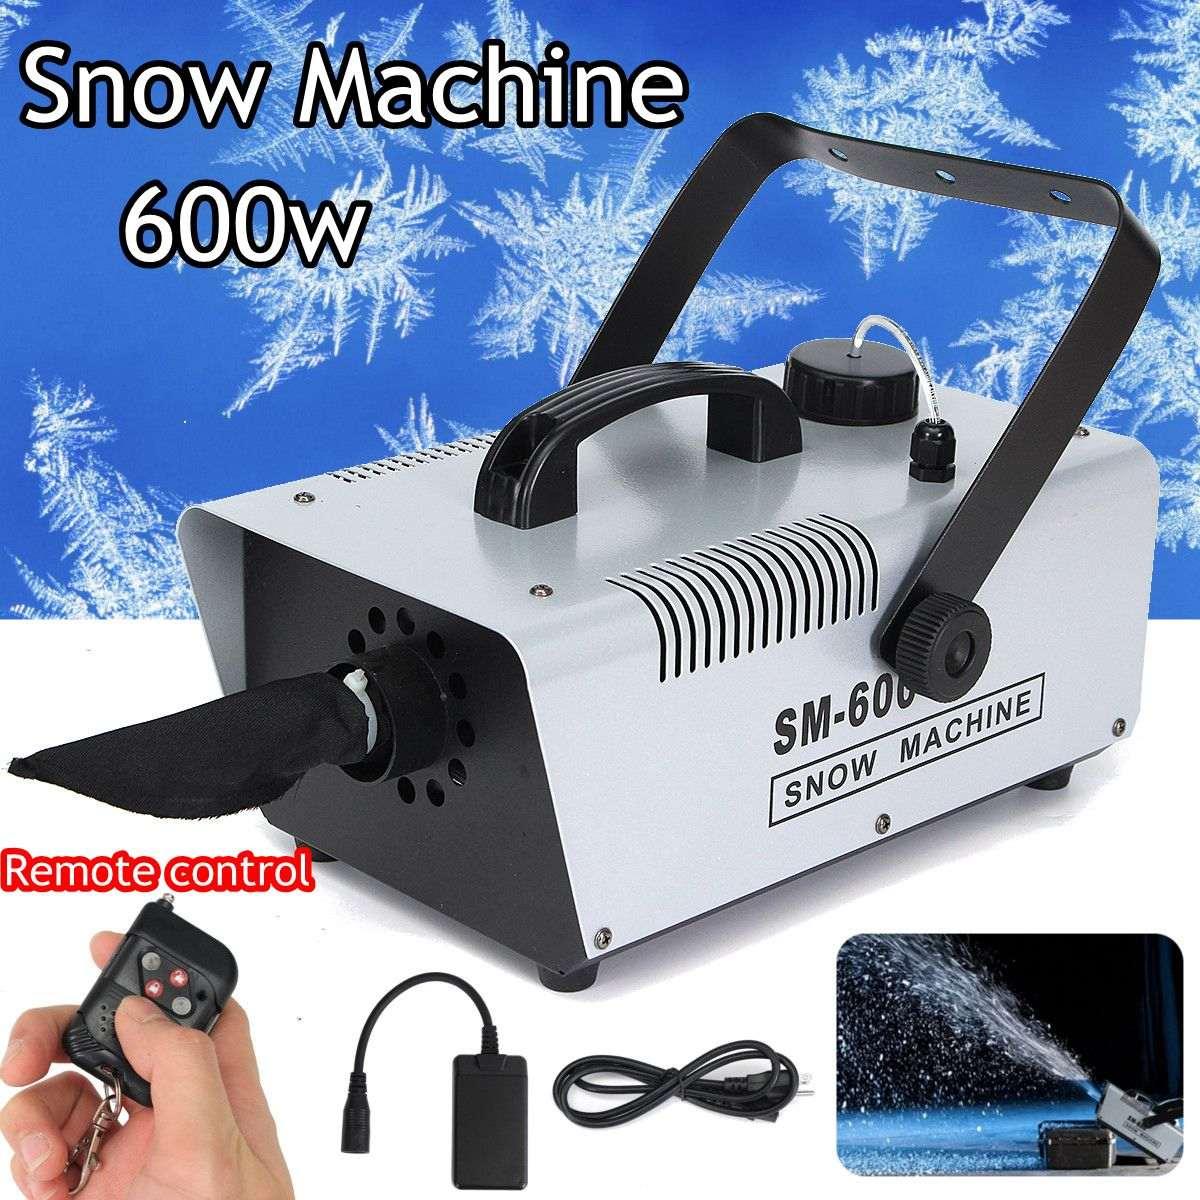 Remoter + Wire control 600W snow machine wedding snow machines professional DJ equipment 100% newRemoter + Wire control 600W snow machine wedding snow machines professional DJ equipment 100% new